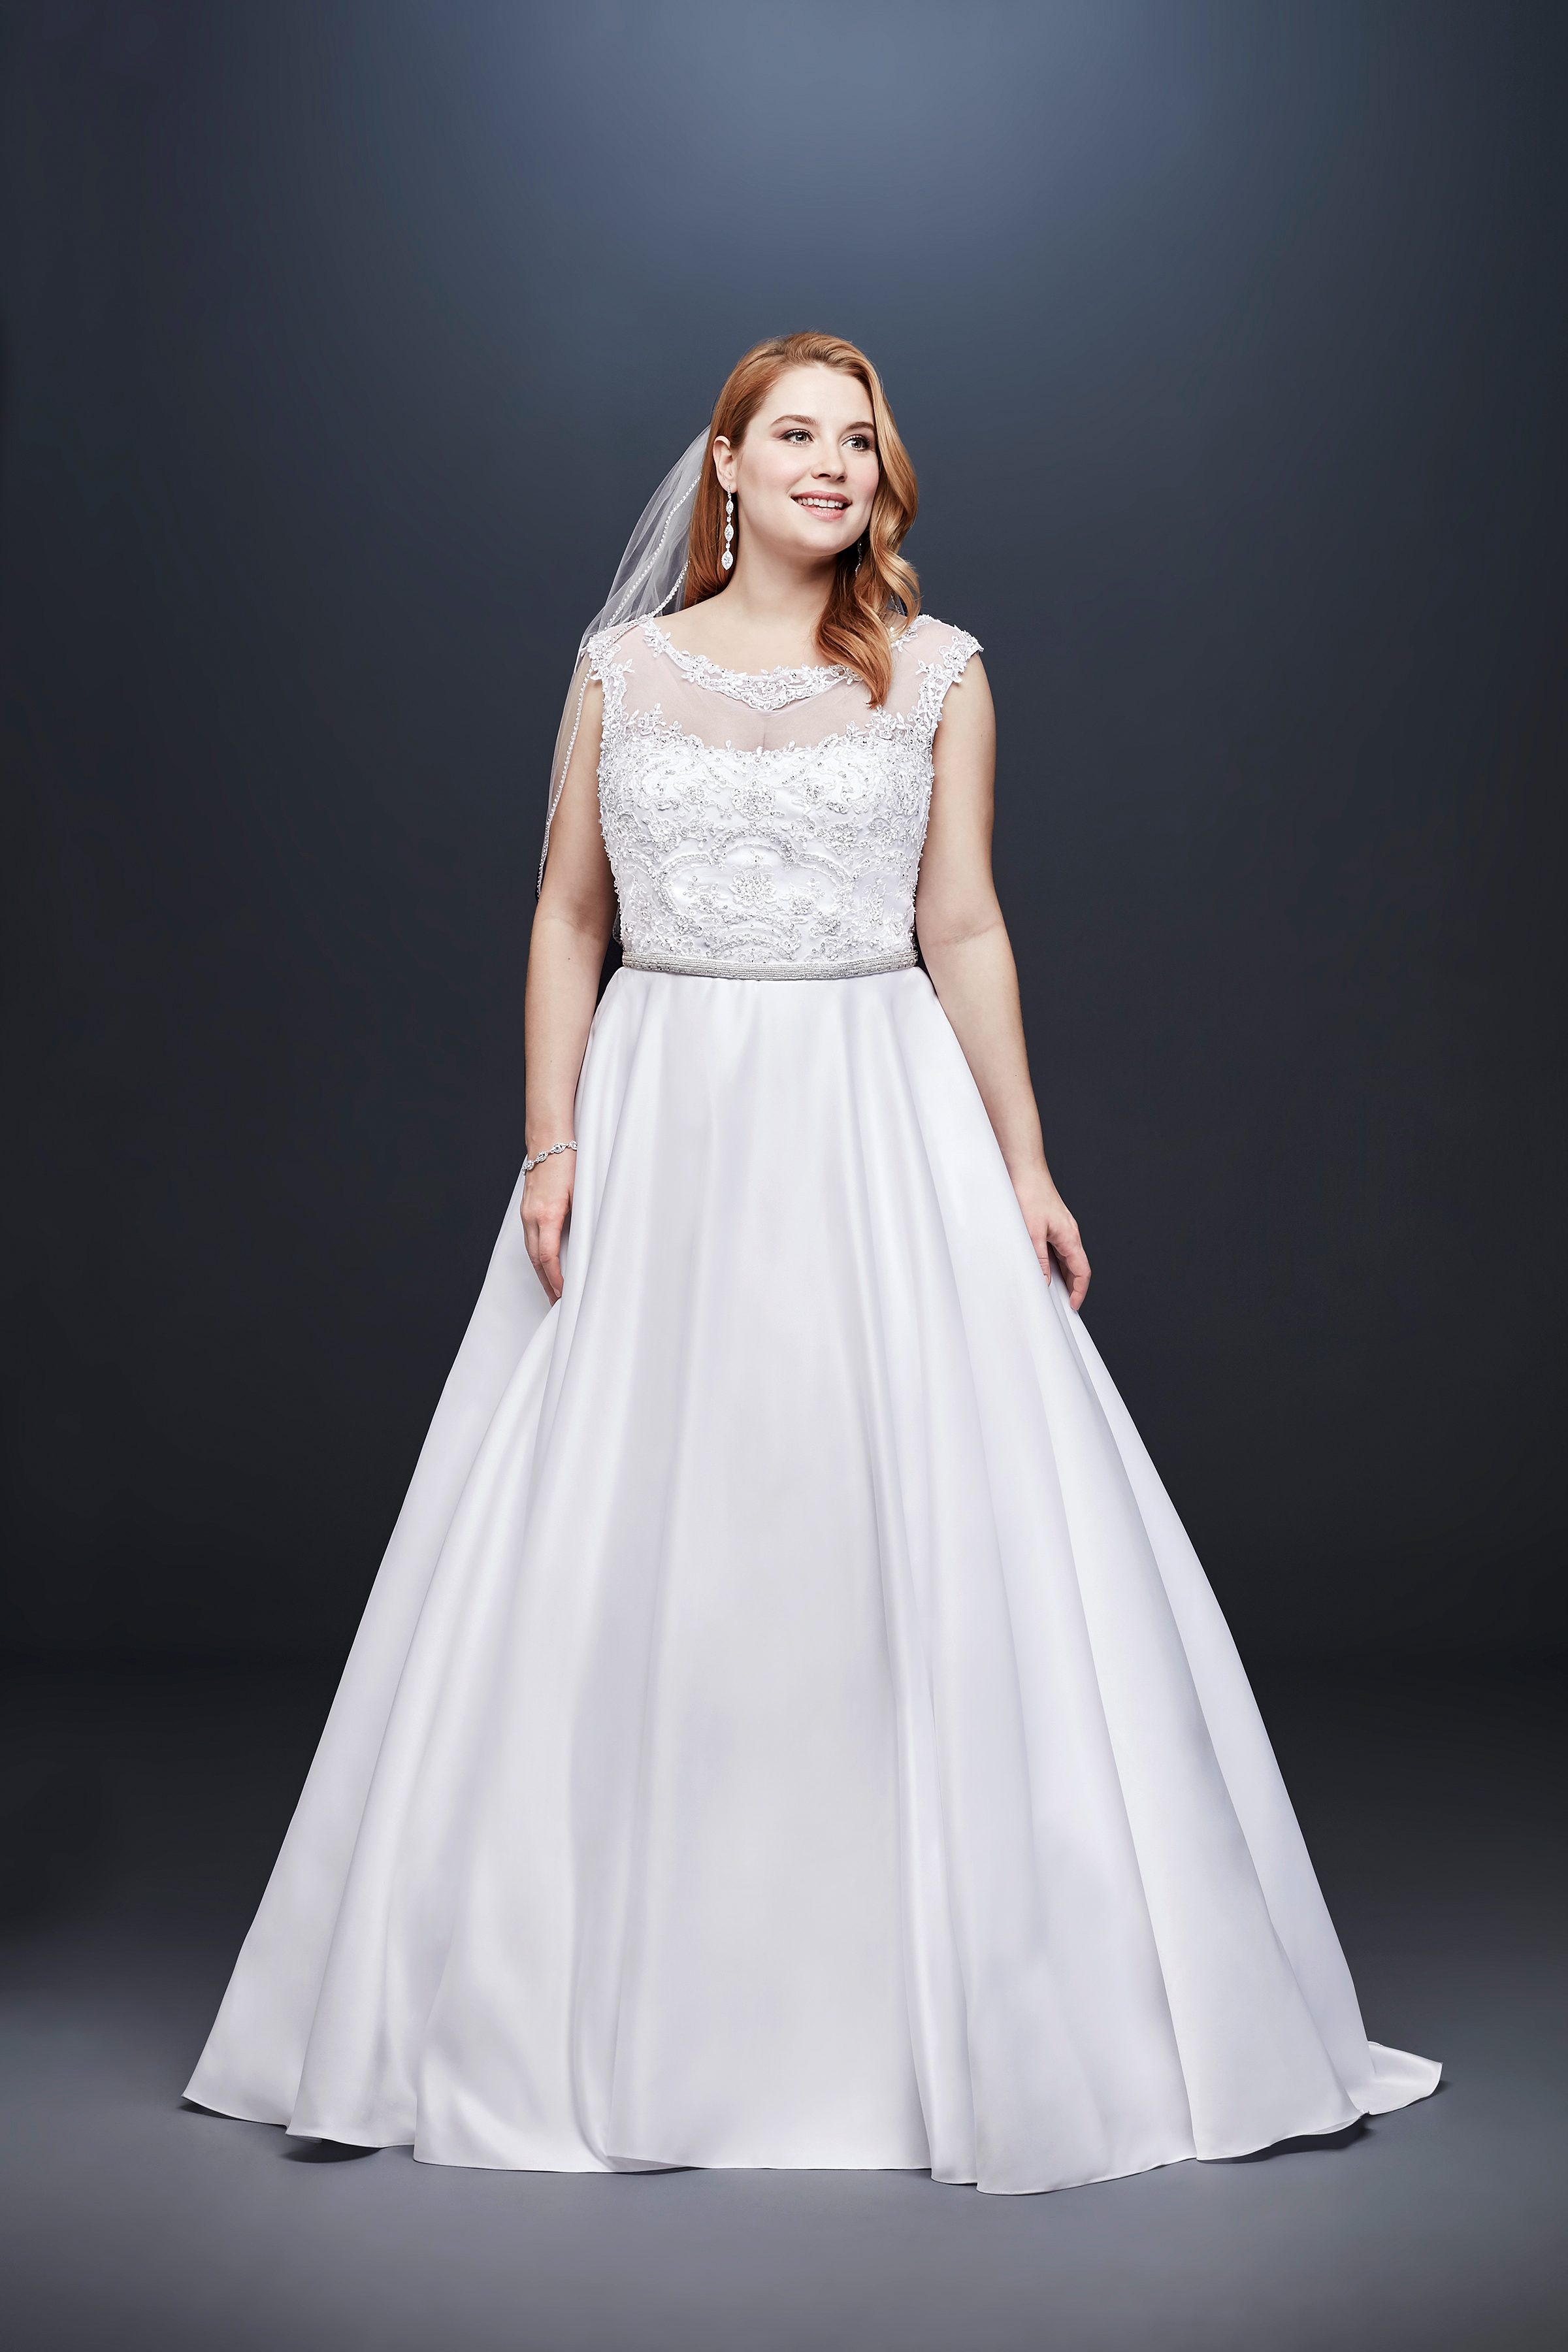 david bridal wedding dress spring 2019 cap sleeves illusion a-line